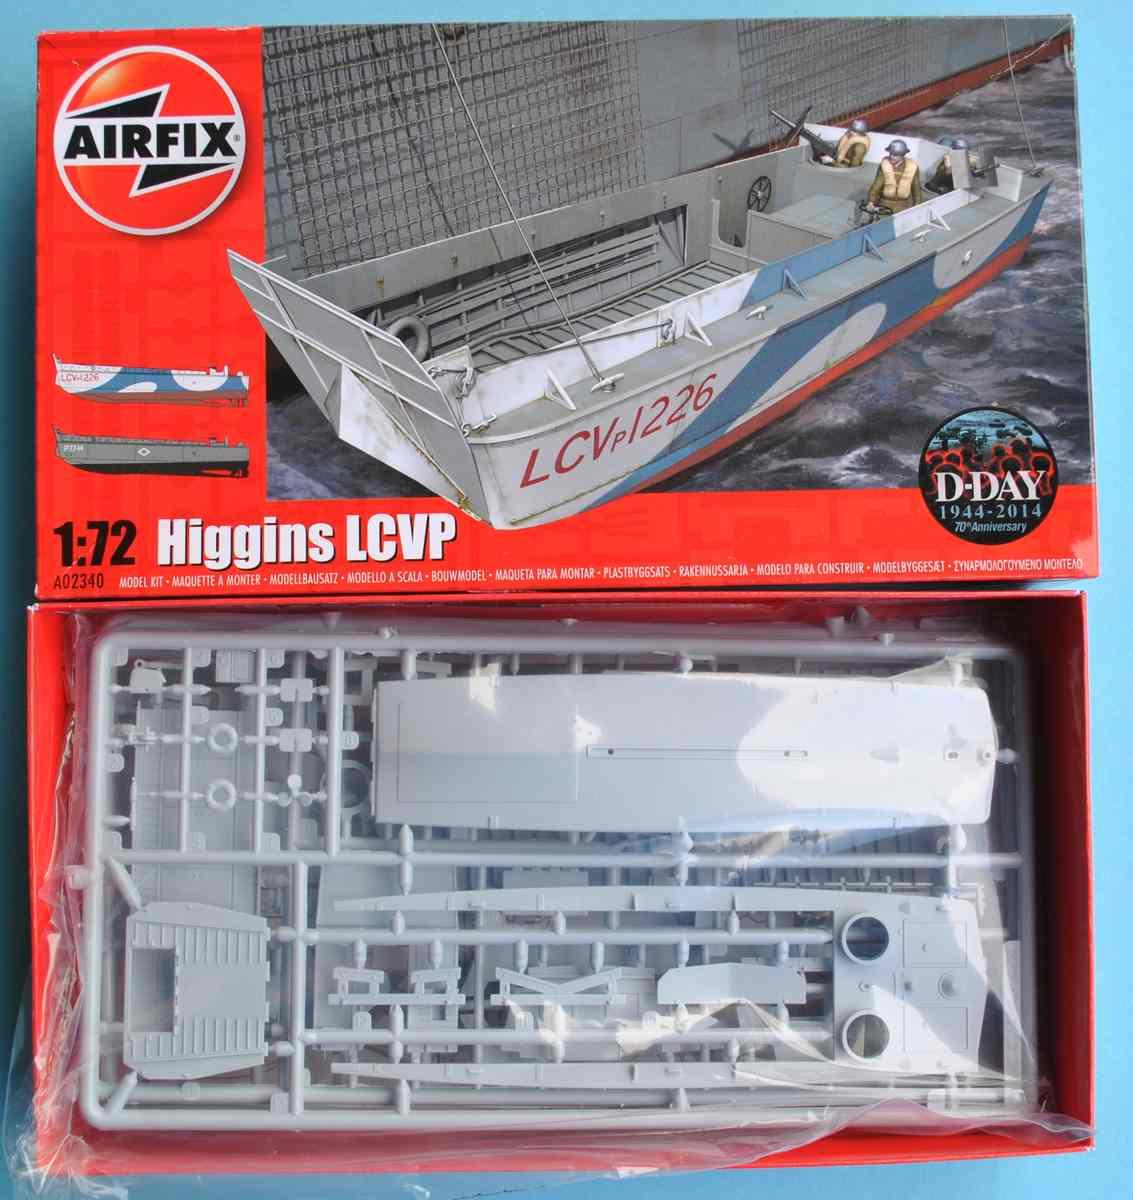 "Airfix-A02340-Higgins-LCVP-21 Das LCVP ""Higgins"" von Airfix im Maßstab 1:72 ( A02340 )"